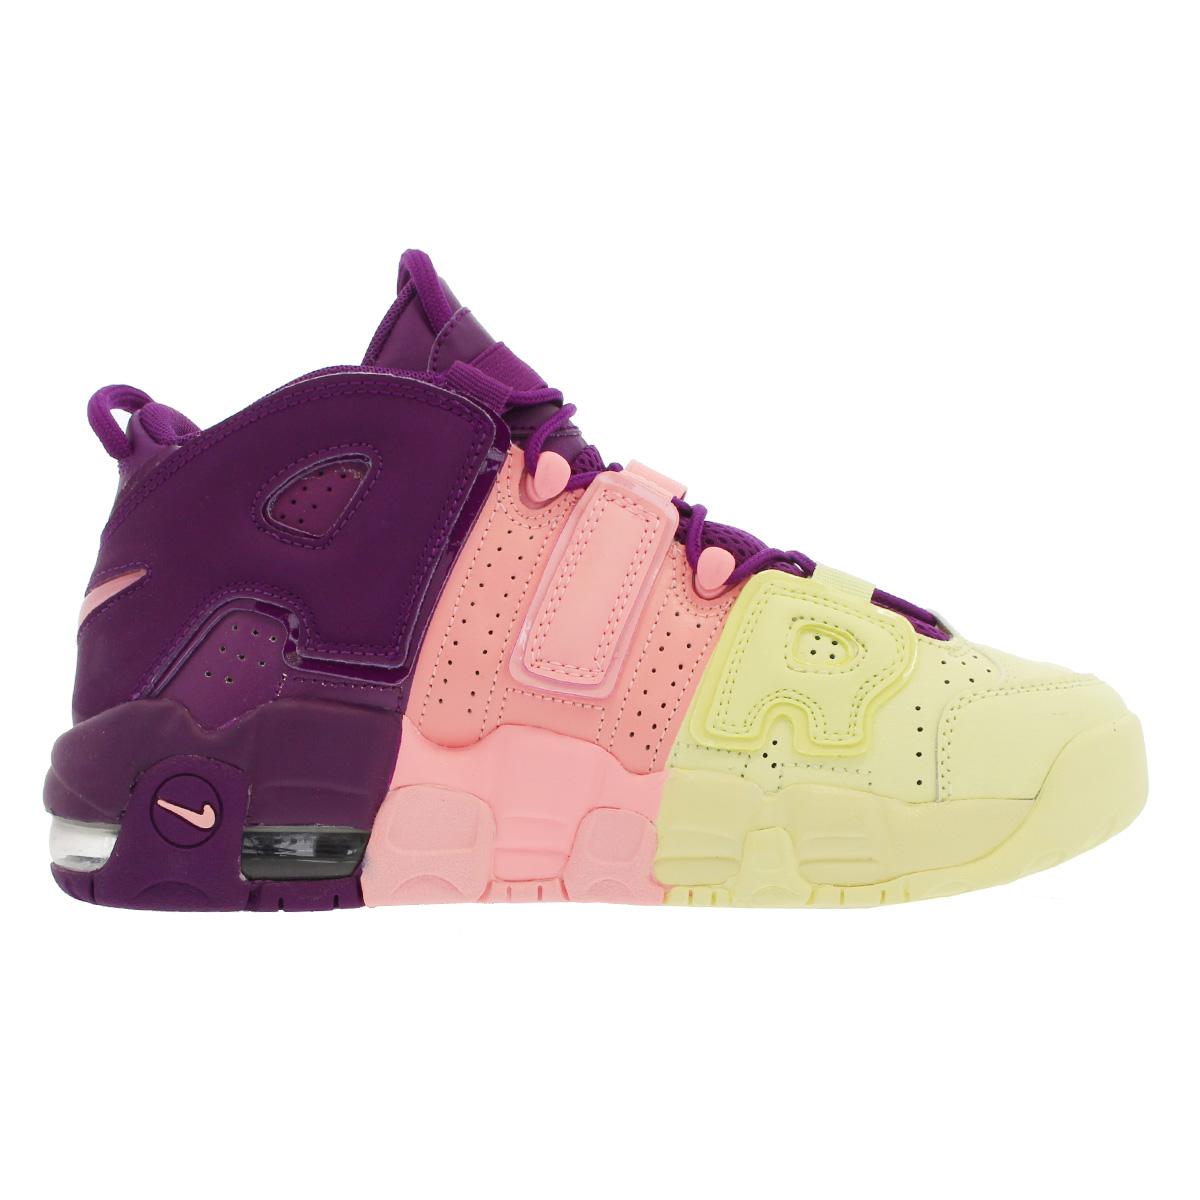 ebca59c38dc NIKE AIR MORE UPTEMPO GS Nike more up tempo GS CITRON PINK BRIGHT PURPLE NIGHT  GRAPE